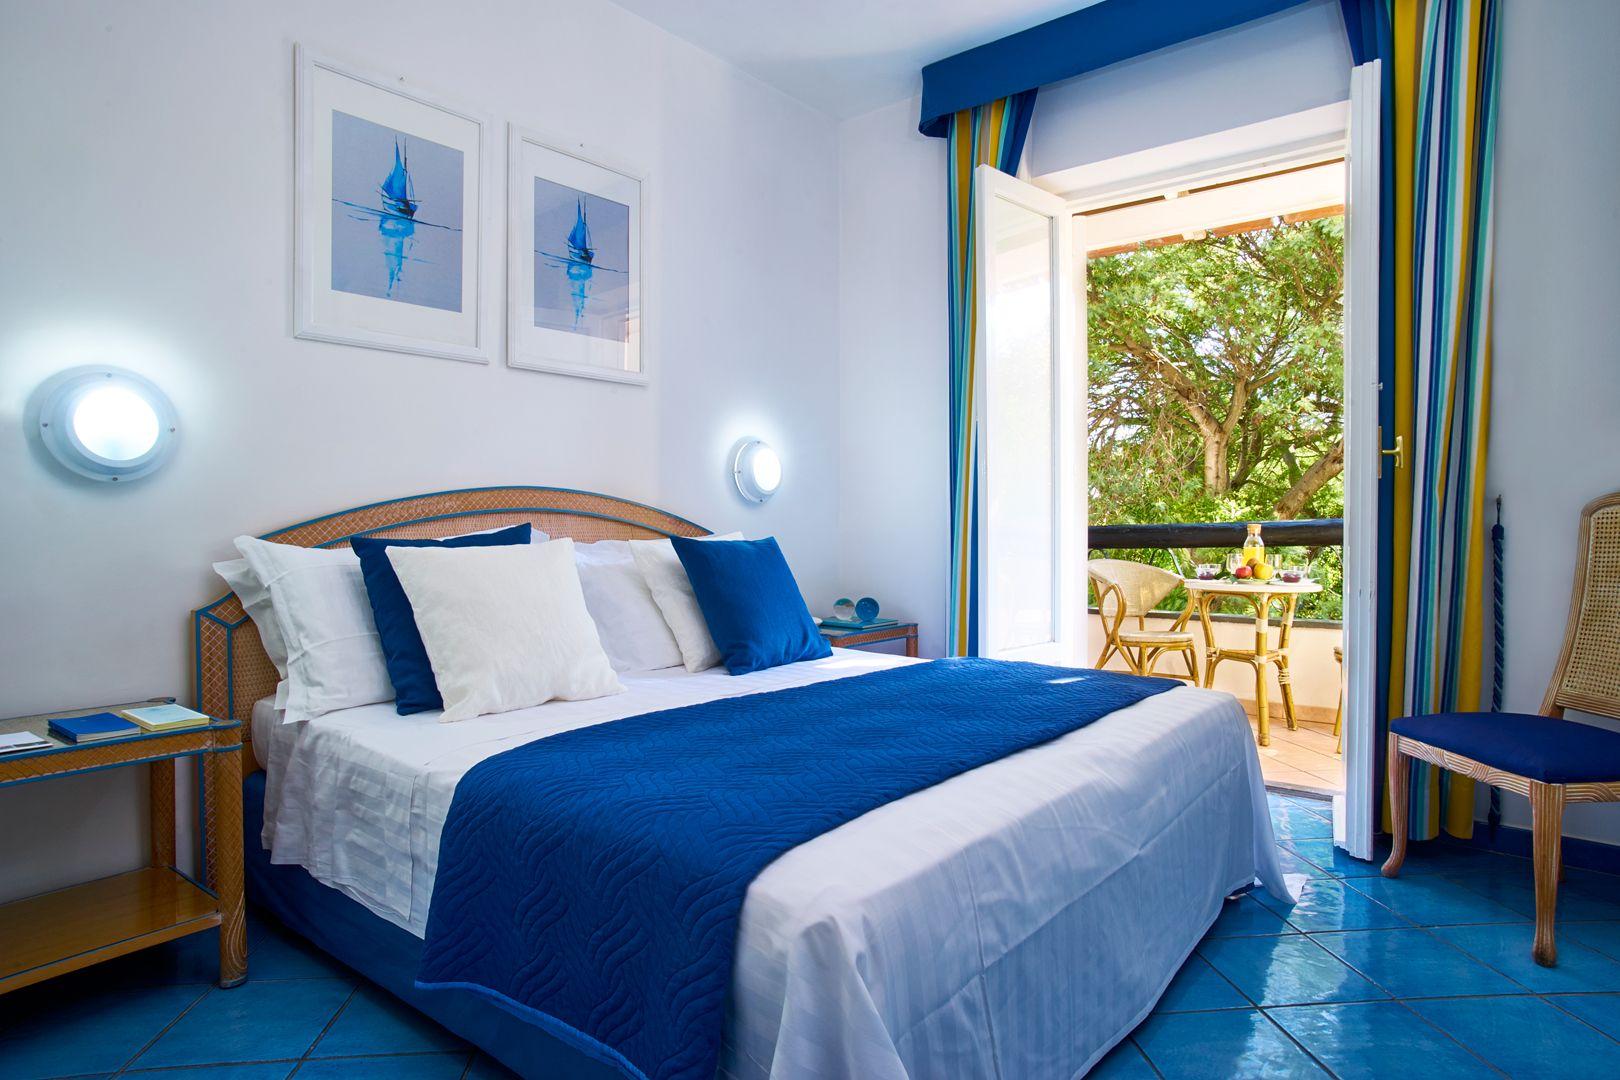 Hotel-central-park-ischia-18